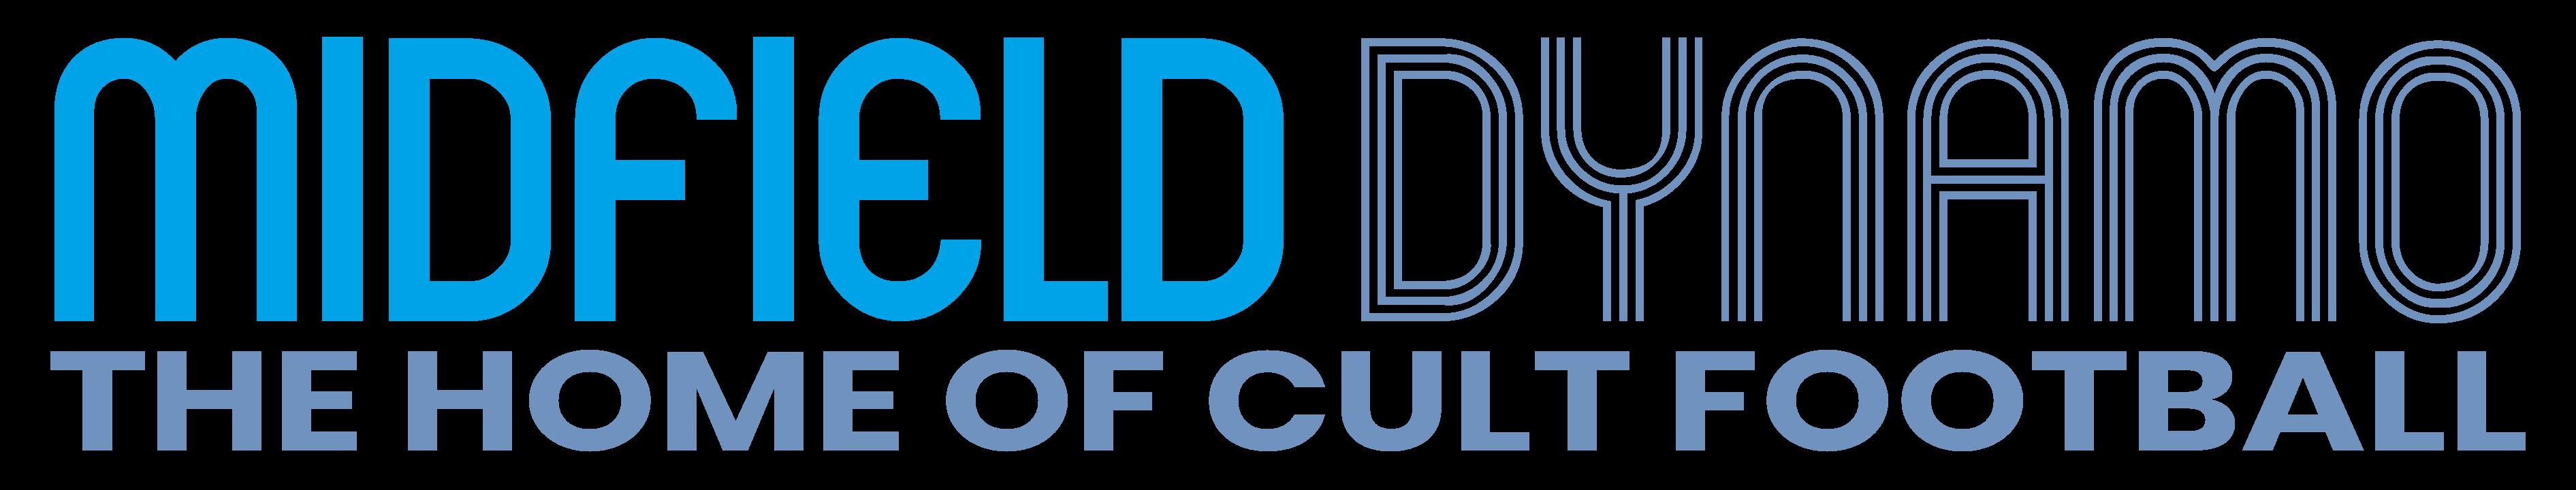 MIDFIELD DYNAMO logo large